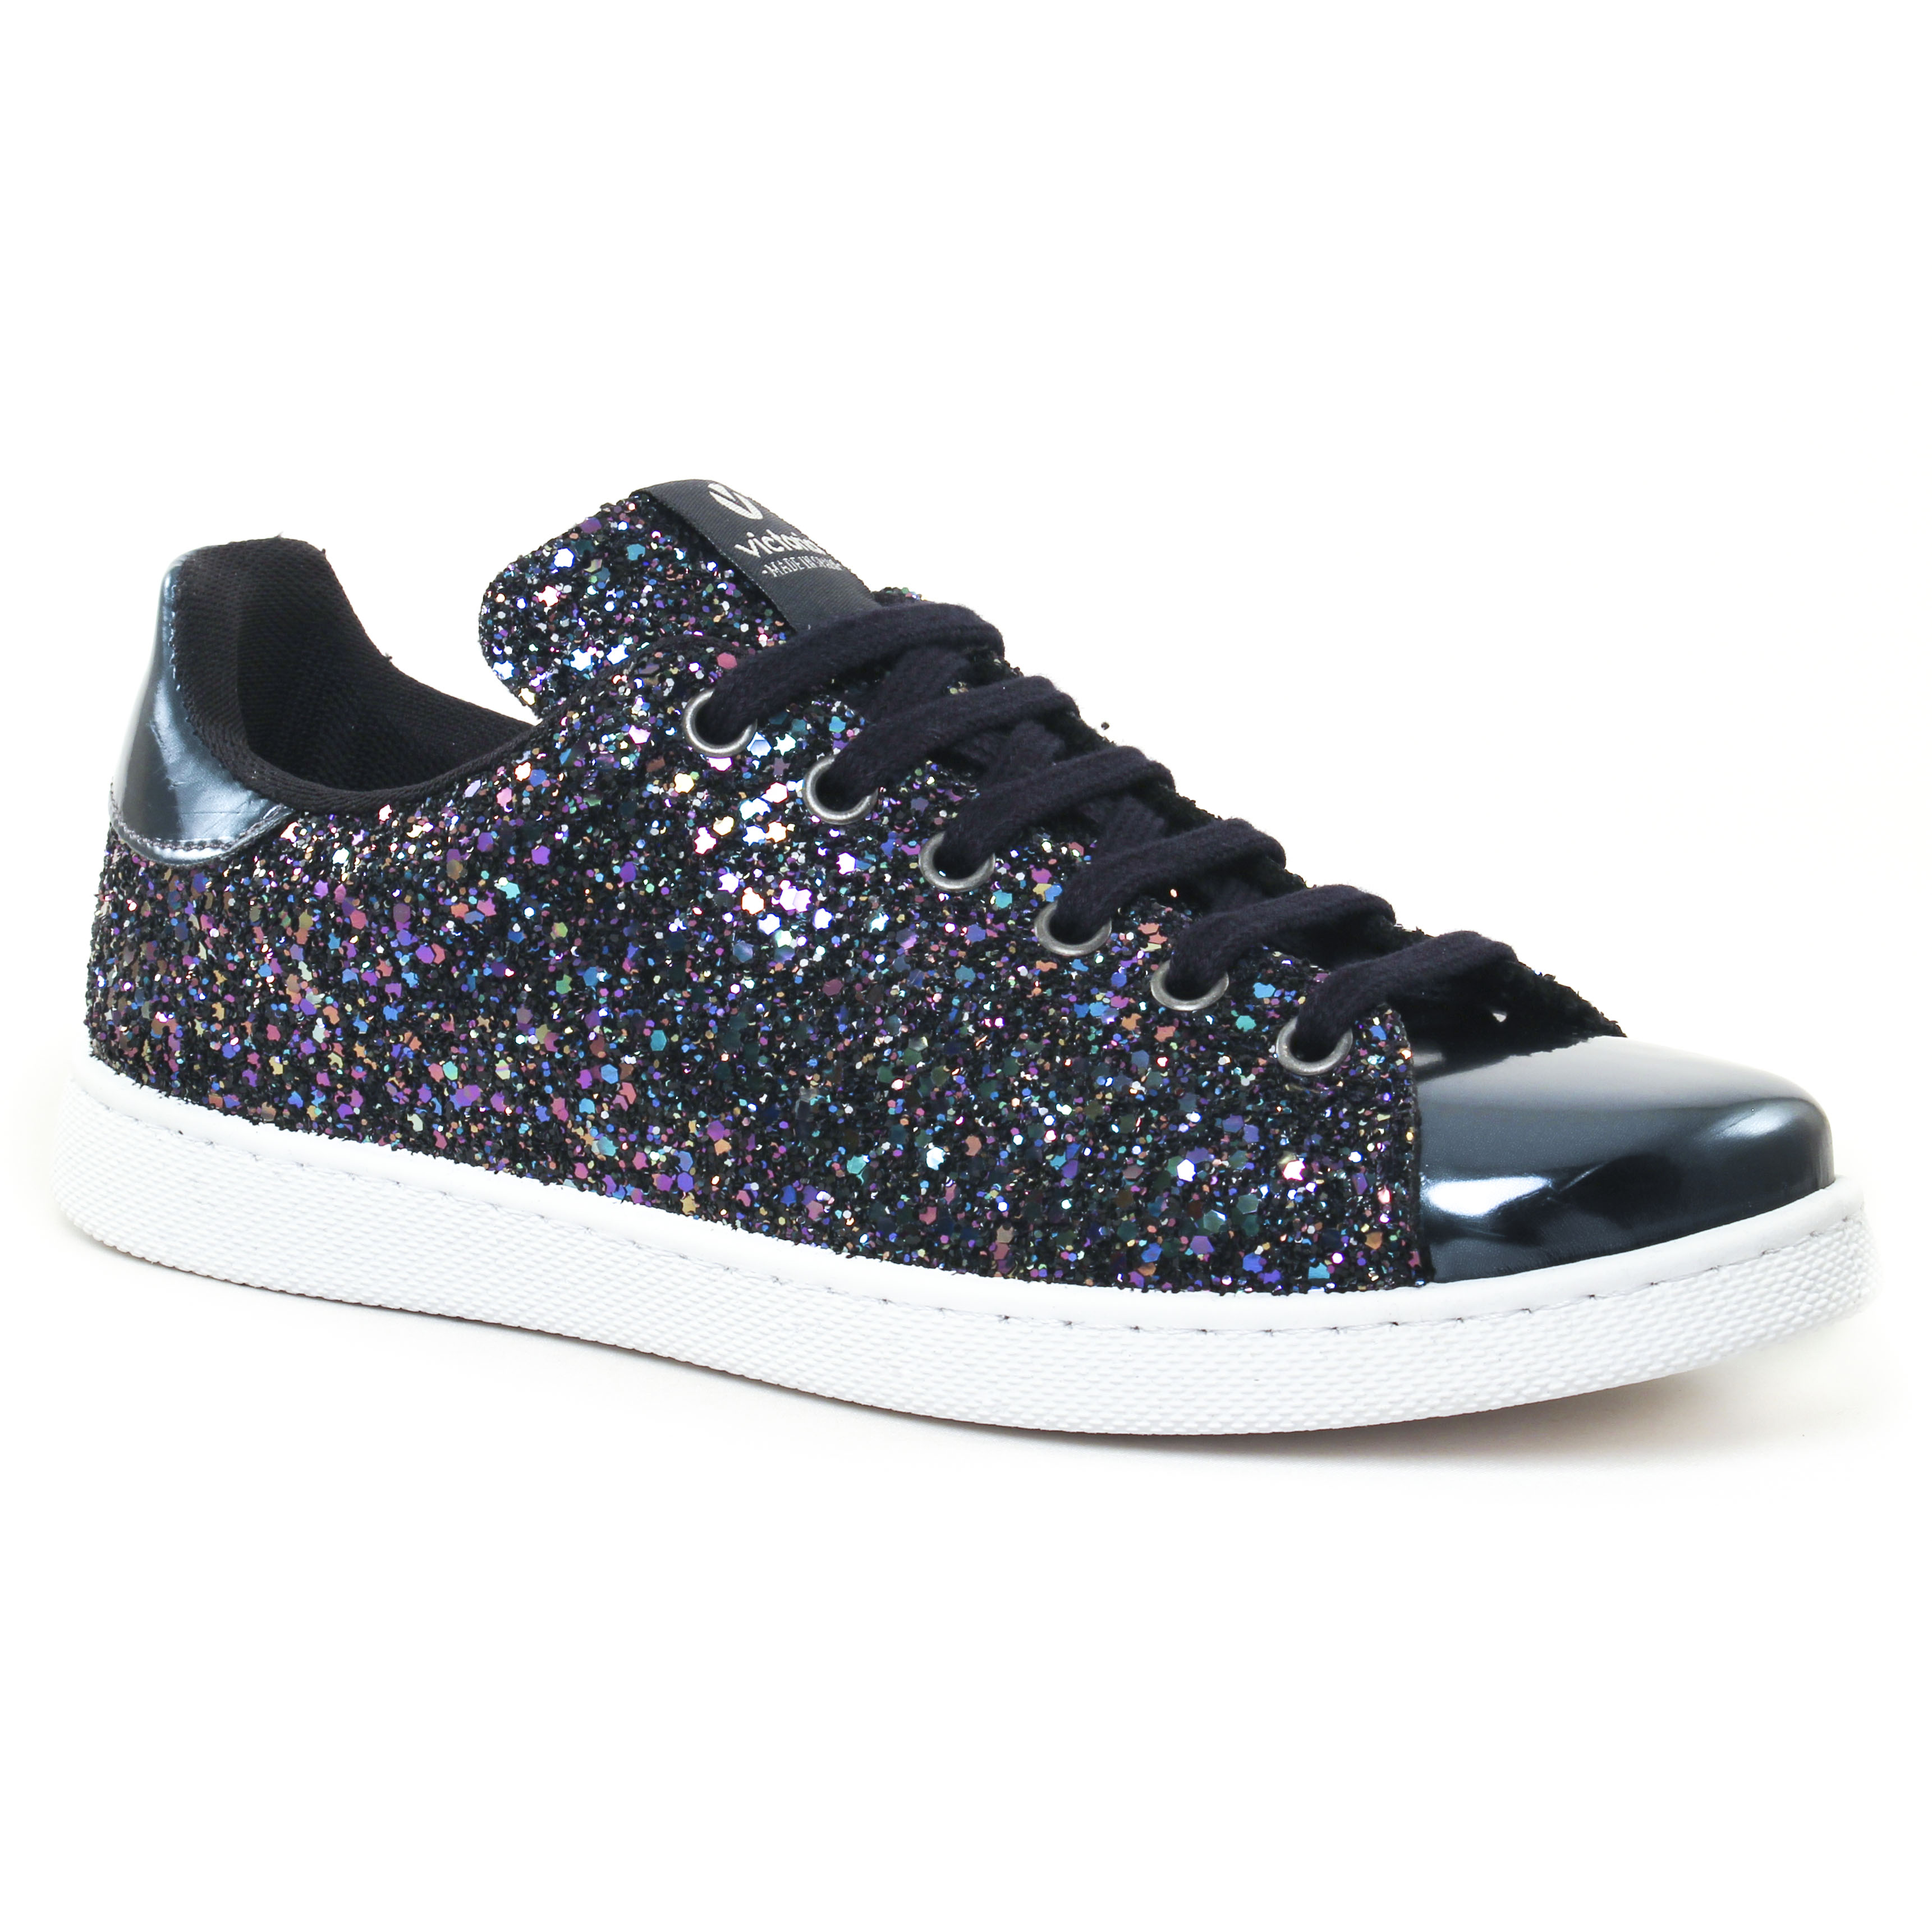 Chaussures Victoria noires Fashion homme KgFEpDiMZ3